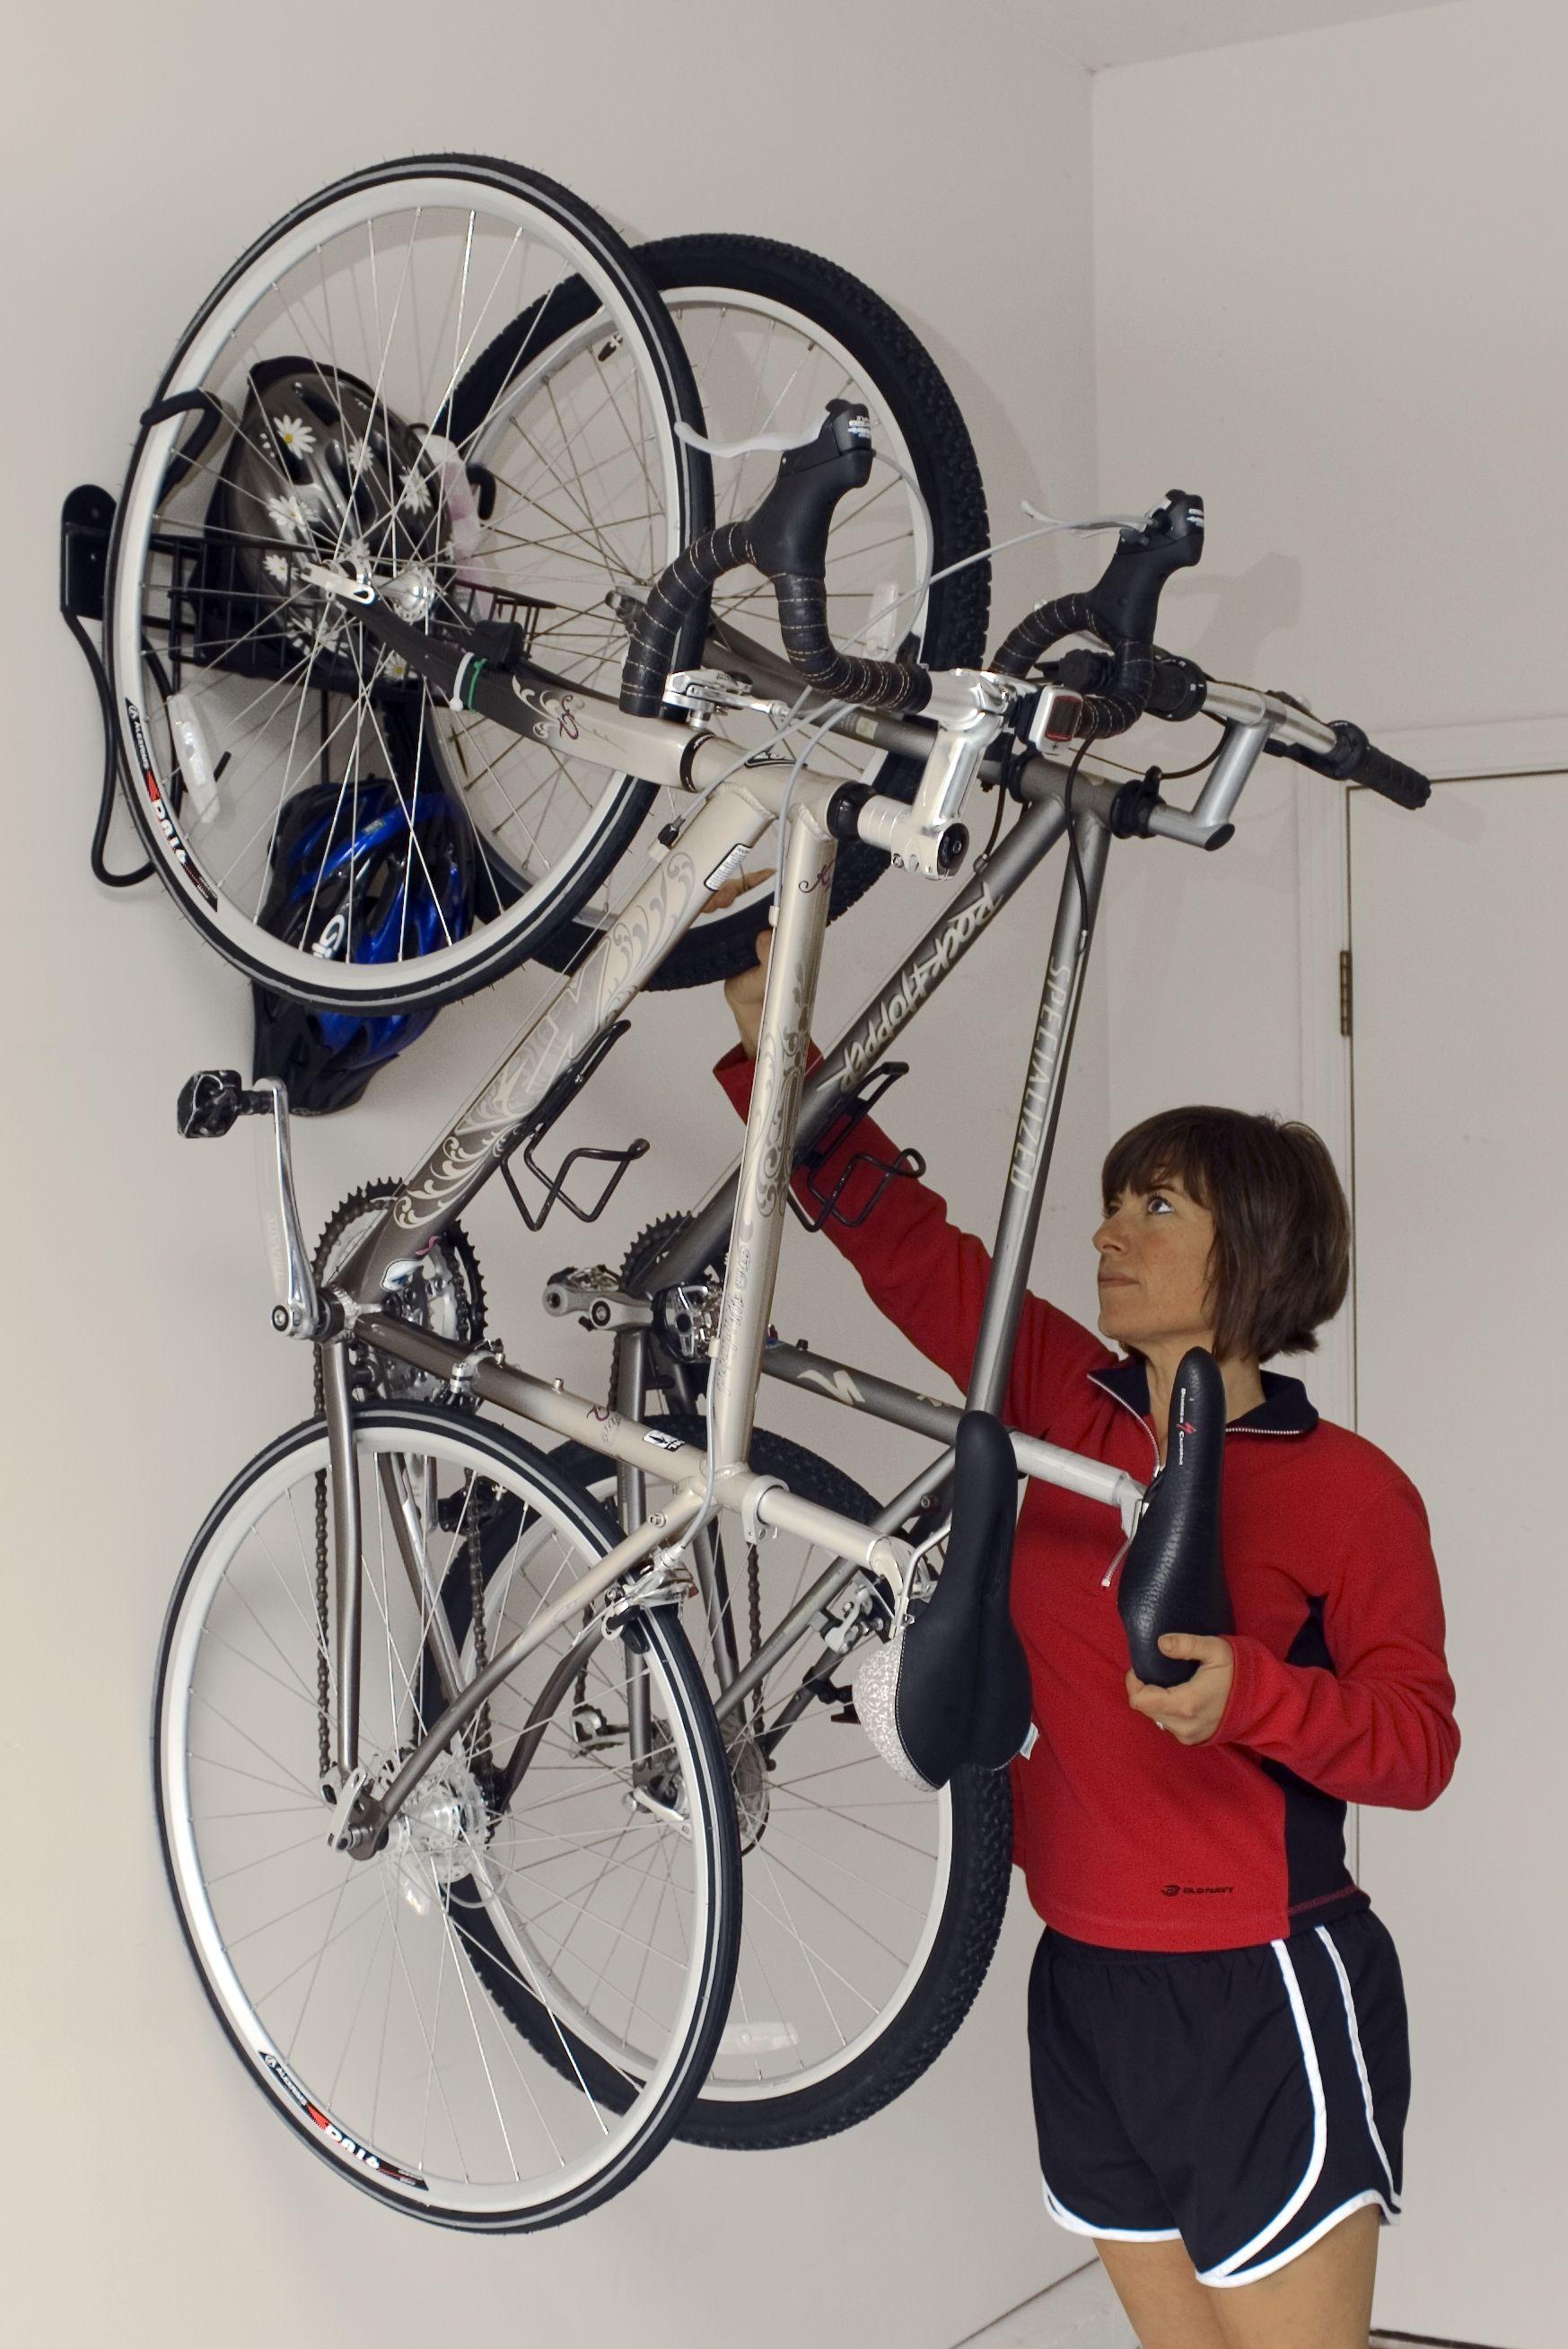 floor gator for systems level lowering overhead uses garage storage ahd bike popular rack lift racks to